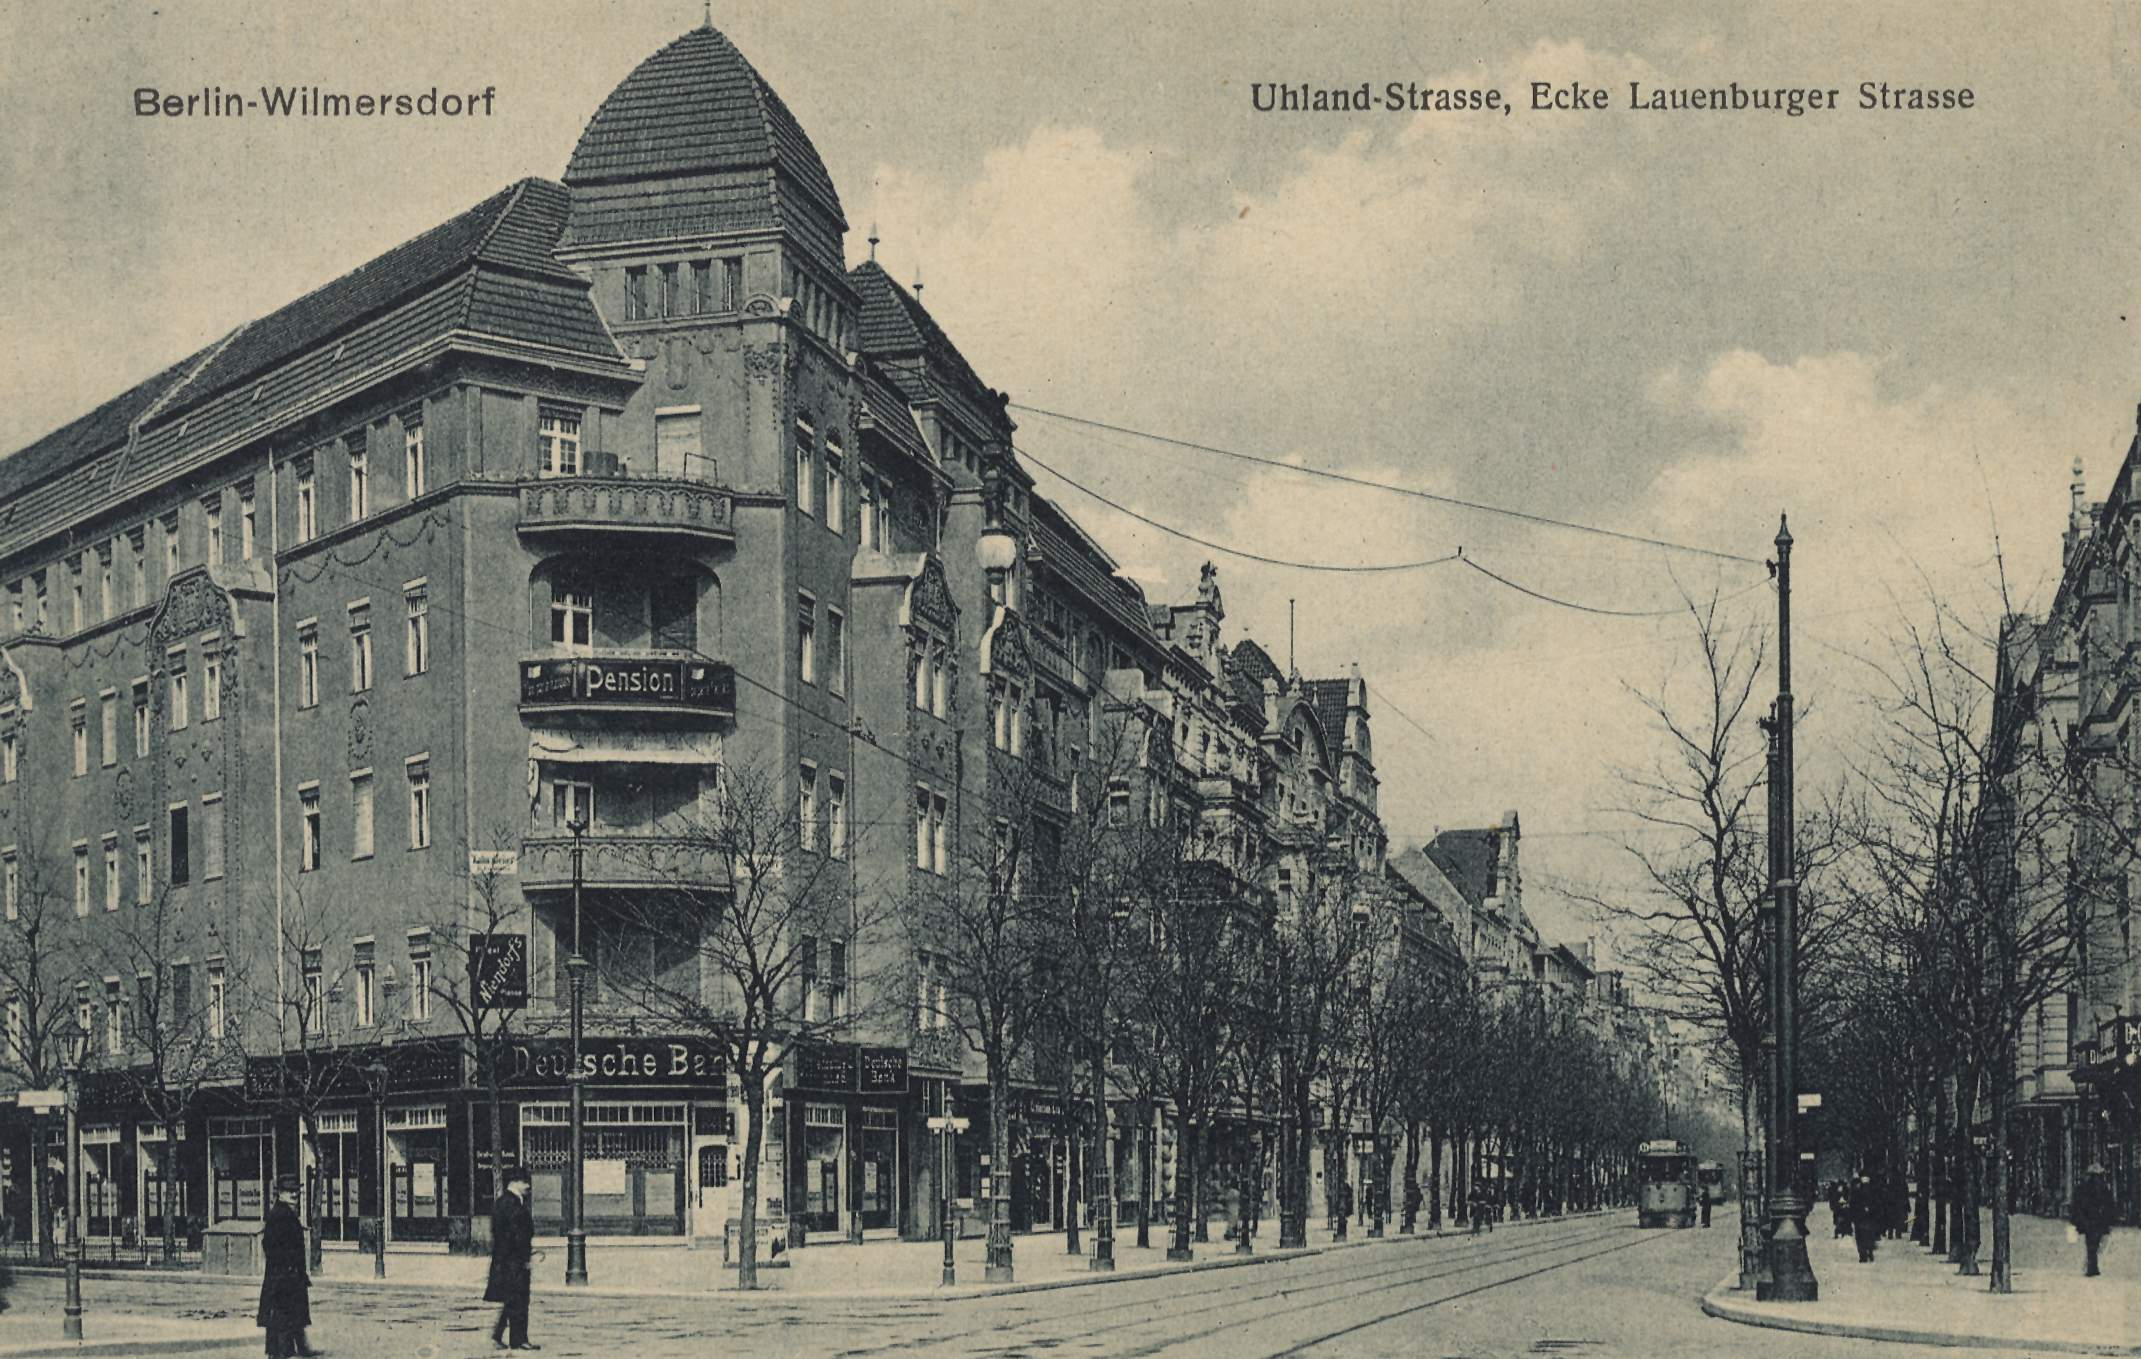 Berlin, Wilmersdorf, Berlin, Uhlandstraße Ecke Lauenburger